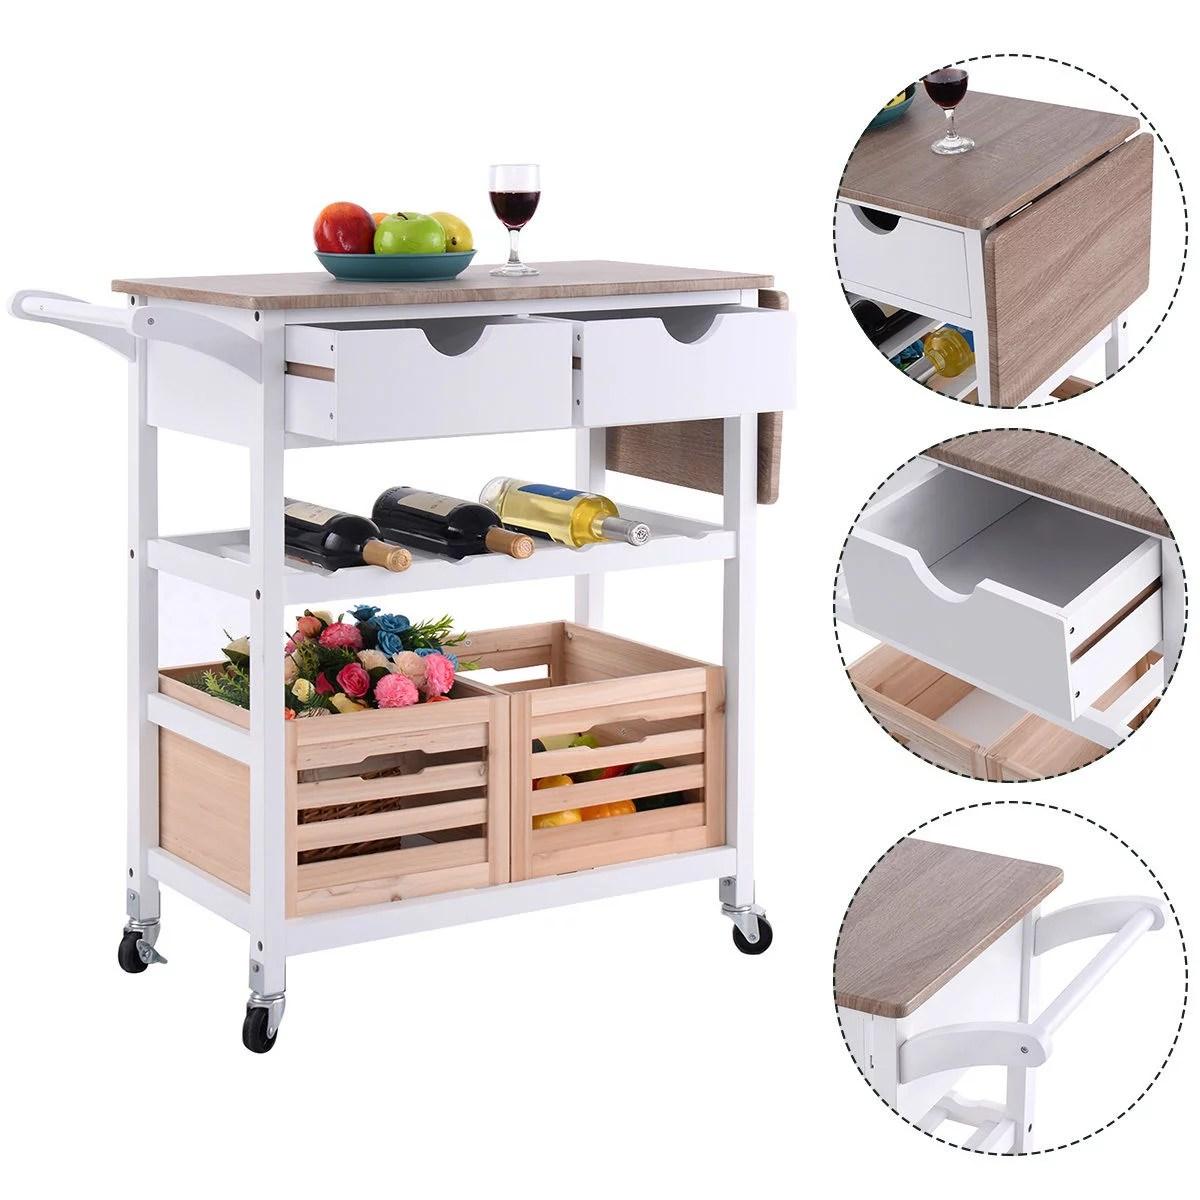 rolling island kitchen aid professional islands carts walmart com product image costway trolley cart drop leaf w storage drawer basket wine rack